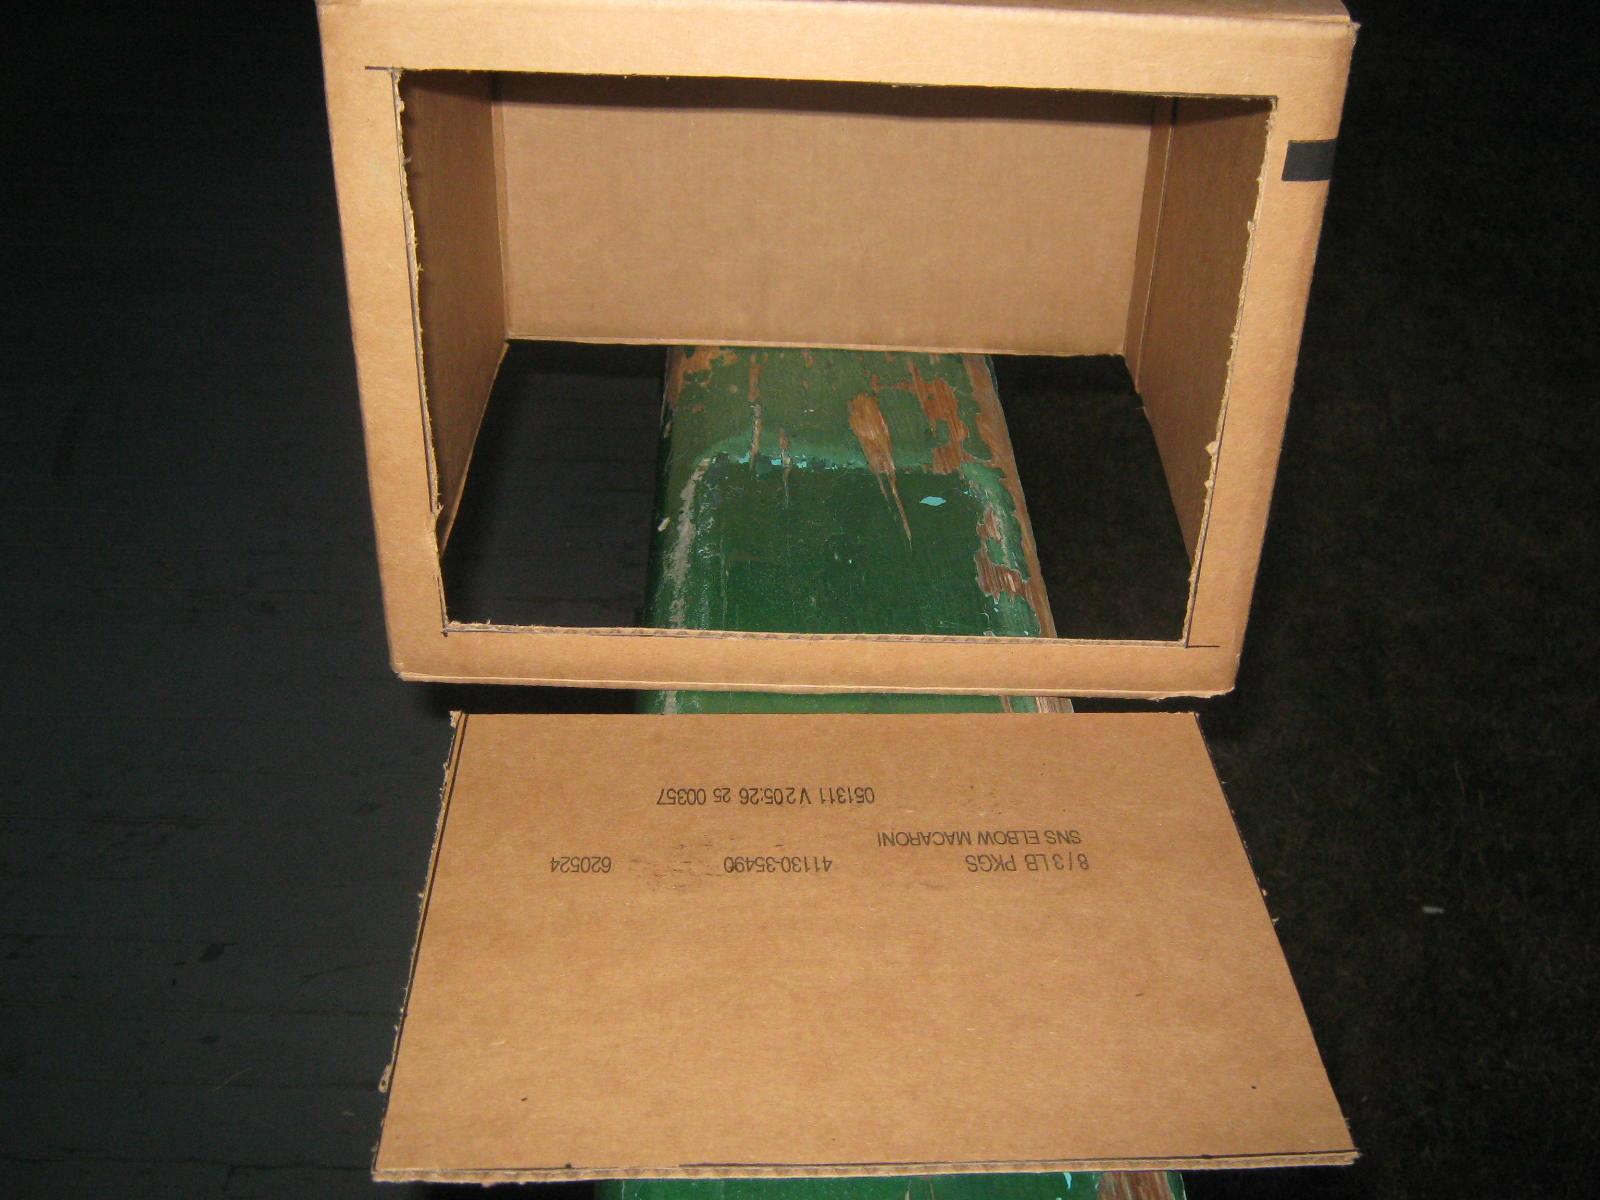 Box, Do, Do-it-yourself, How, It, Light, Macro, Photo, To, Tut, Tutorial, Yourself